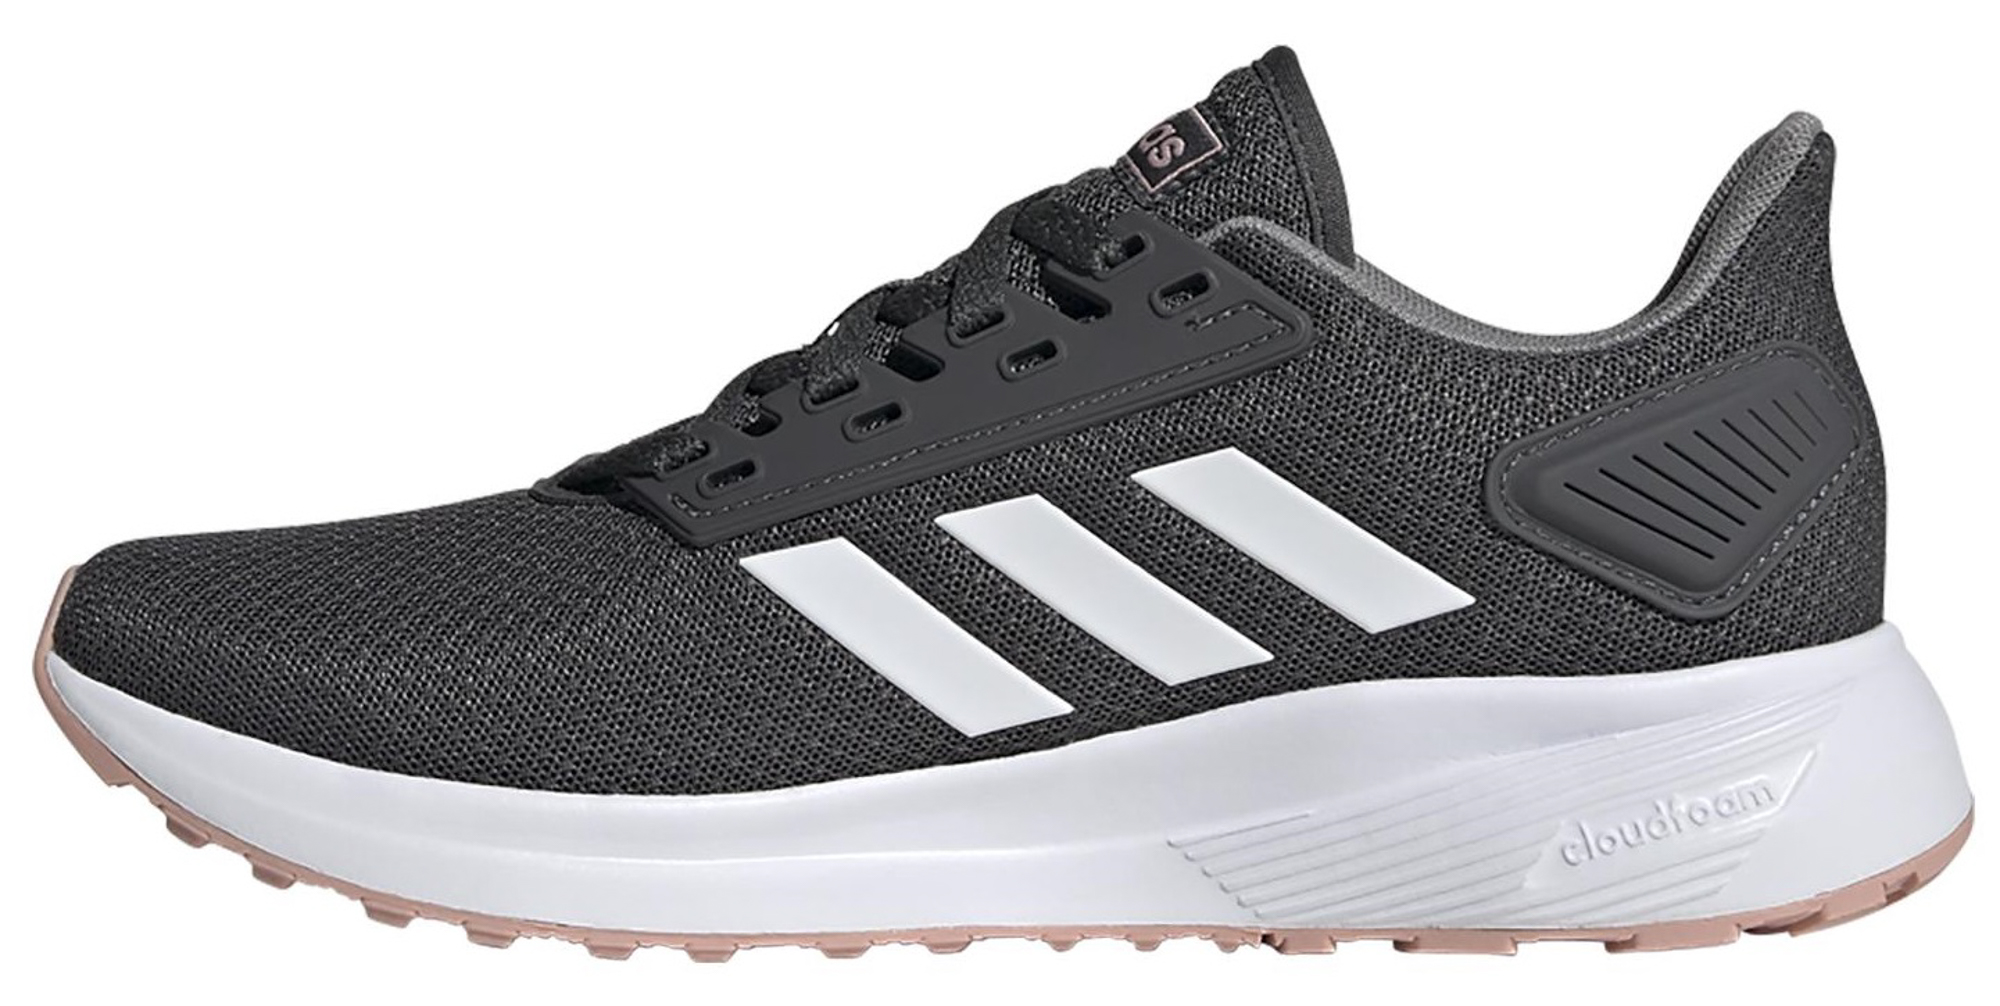 Adidas Кроссовки женские adidas Duramo 9, размер 37